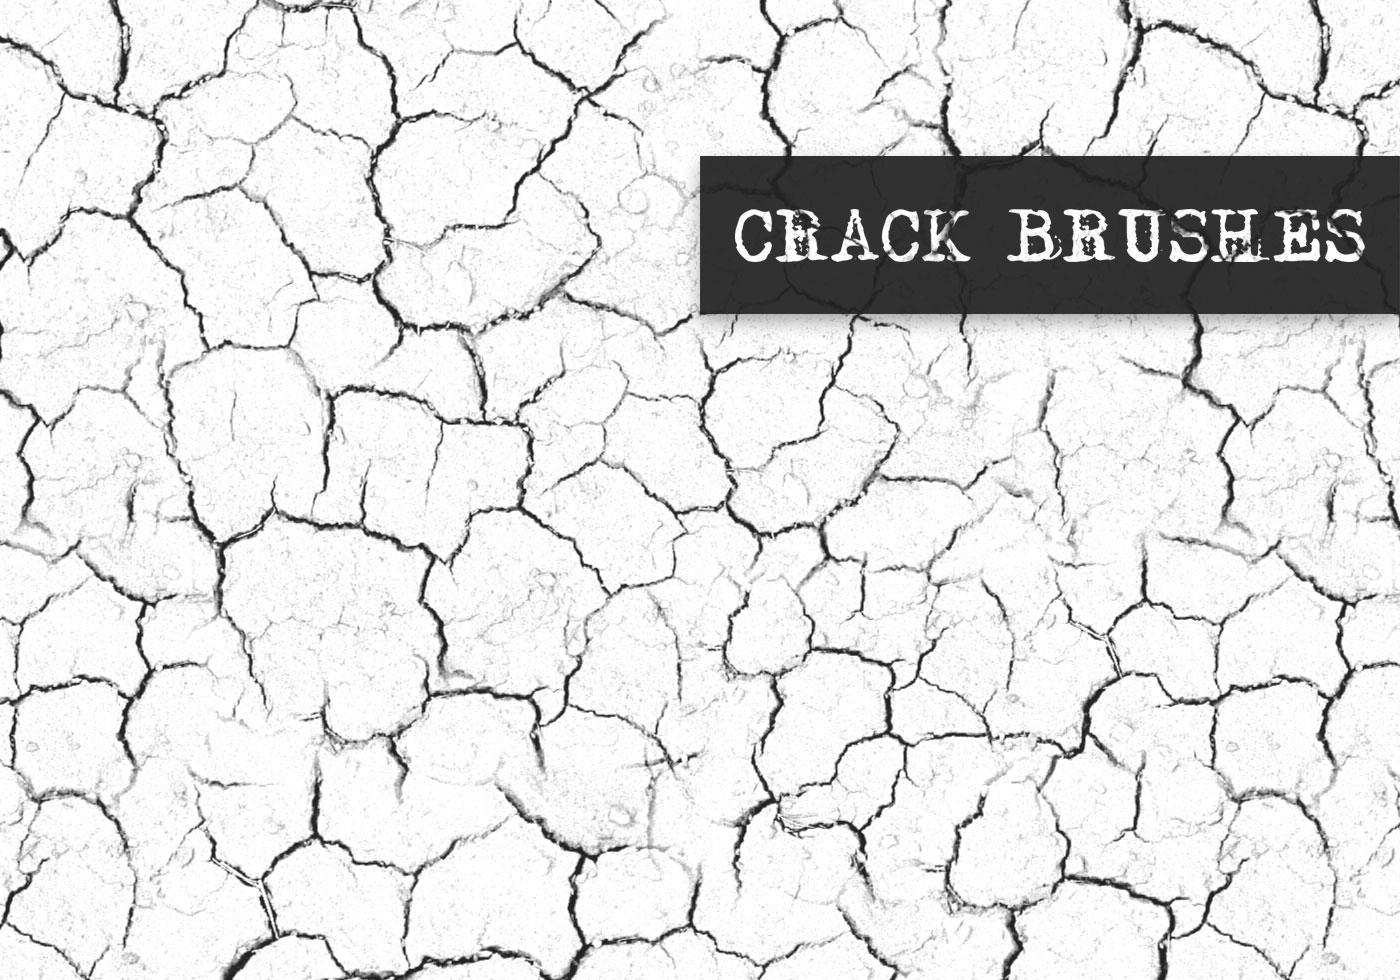 photoshop crack